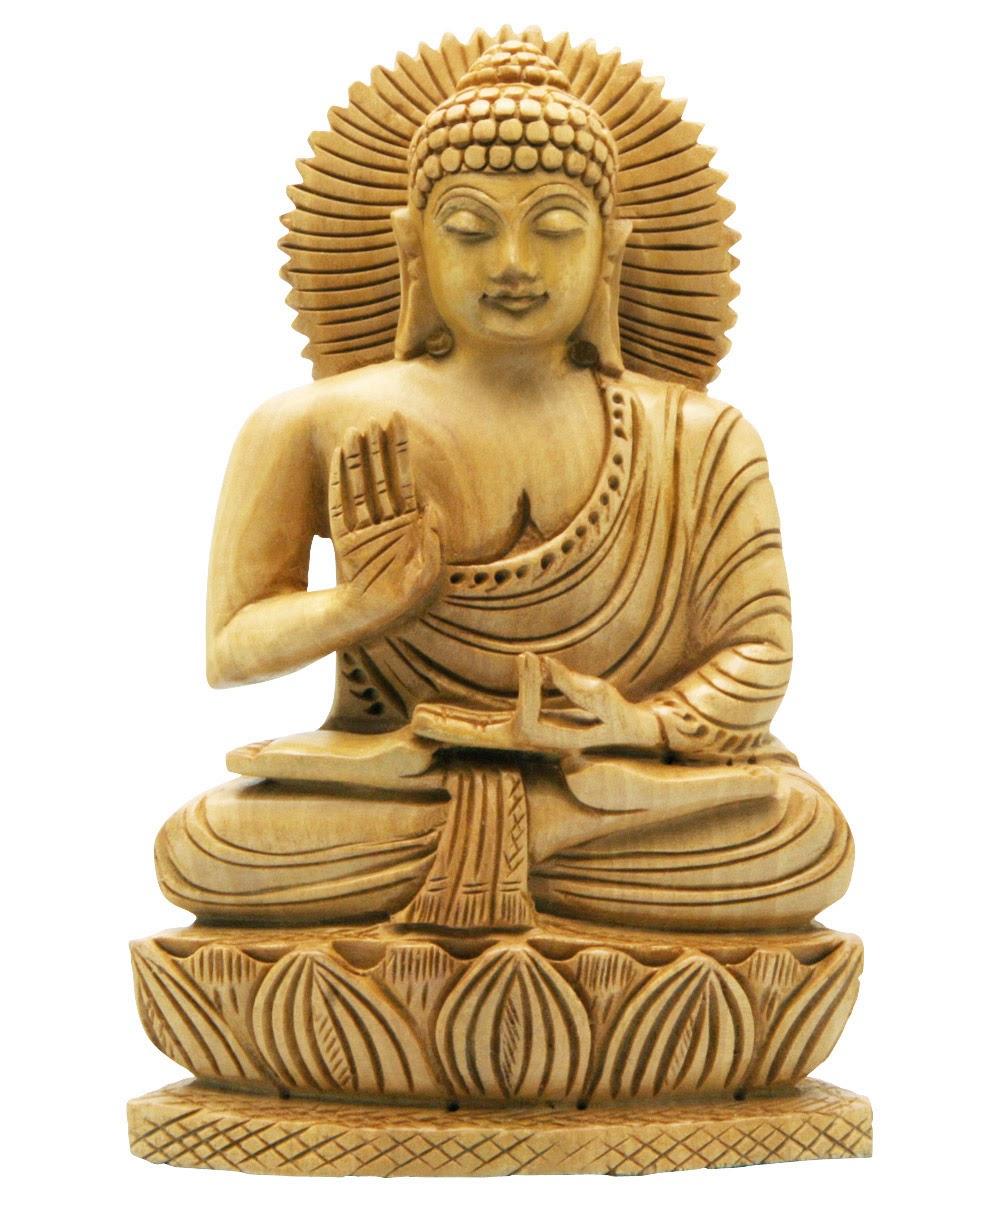 Buddha Purnima 2015 Date